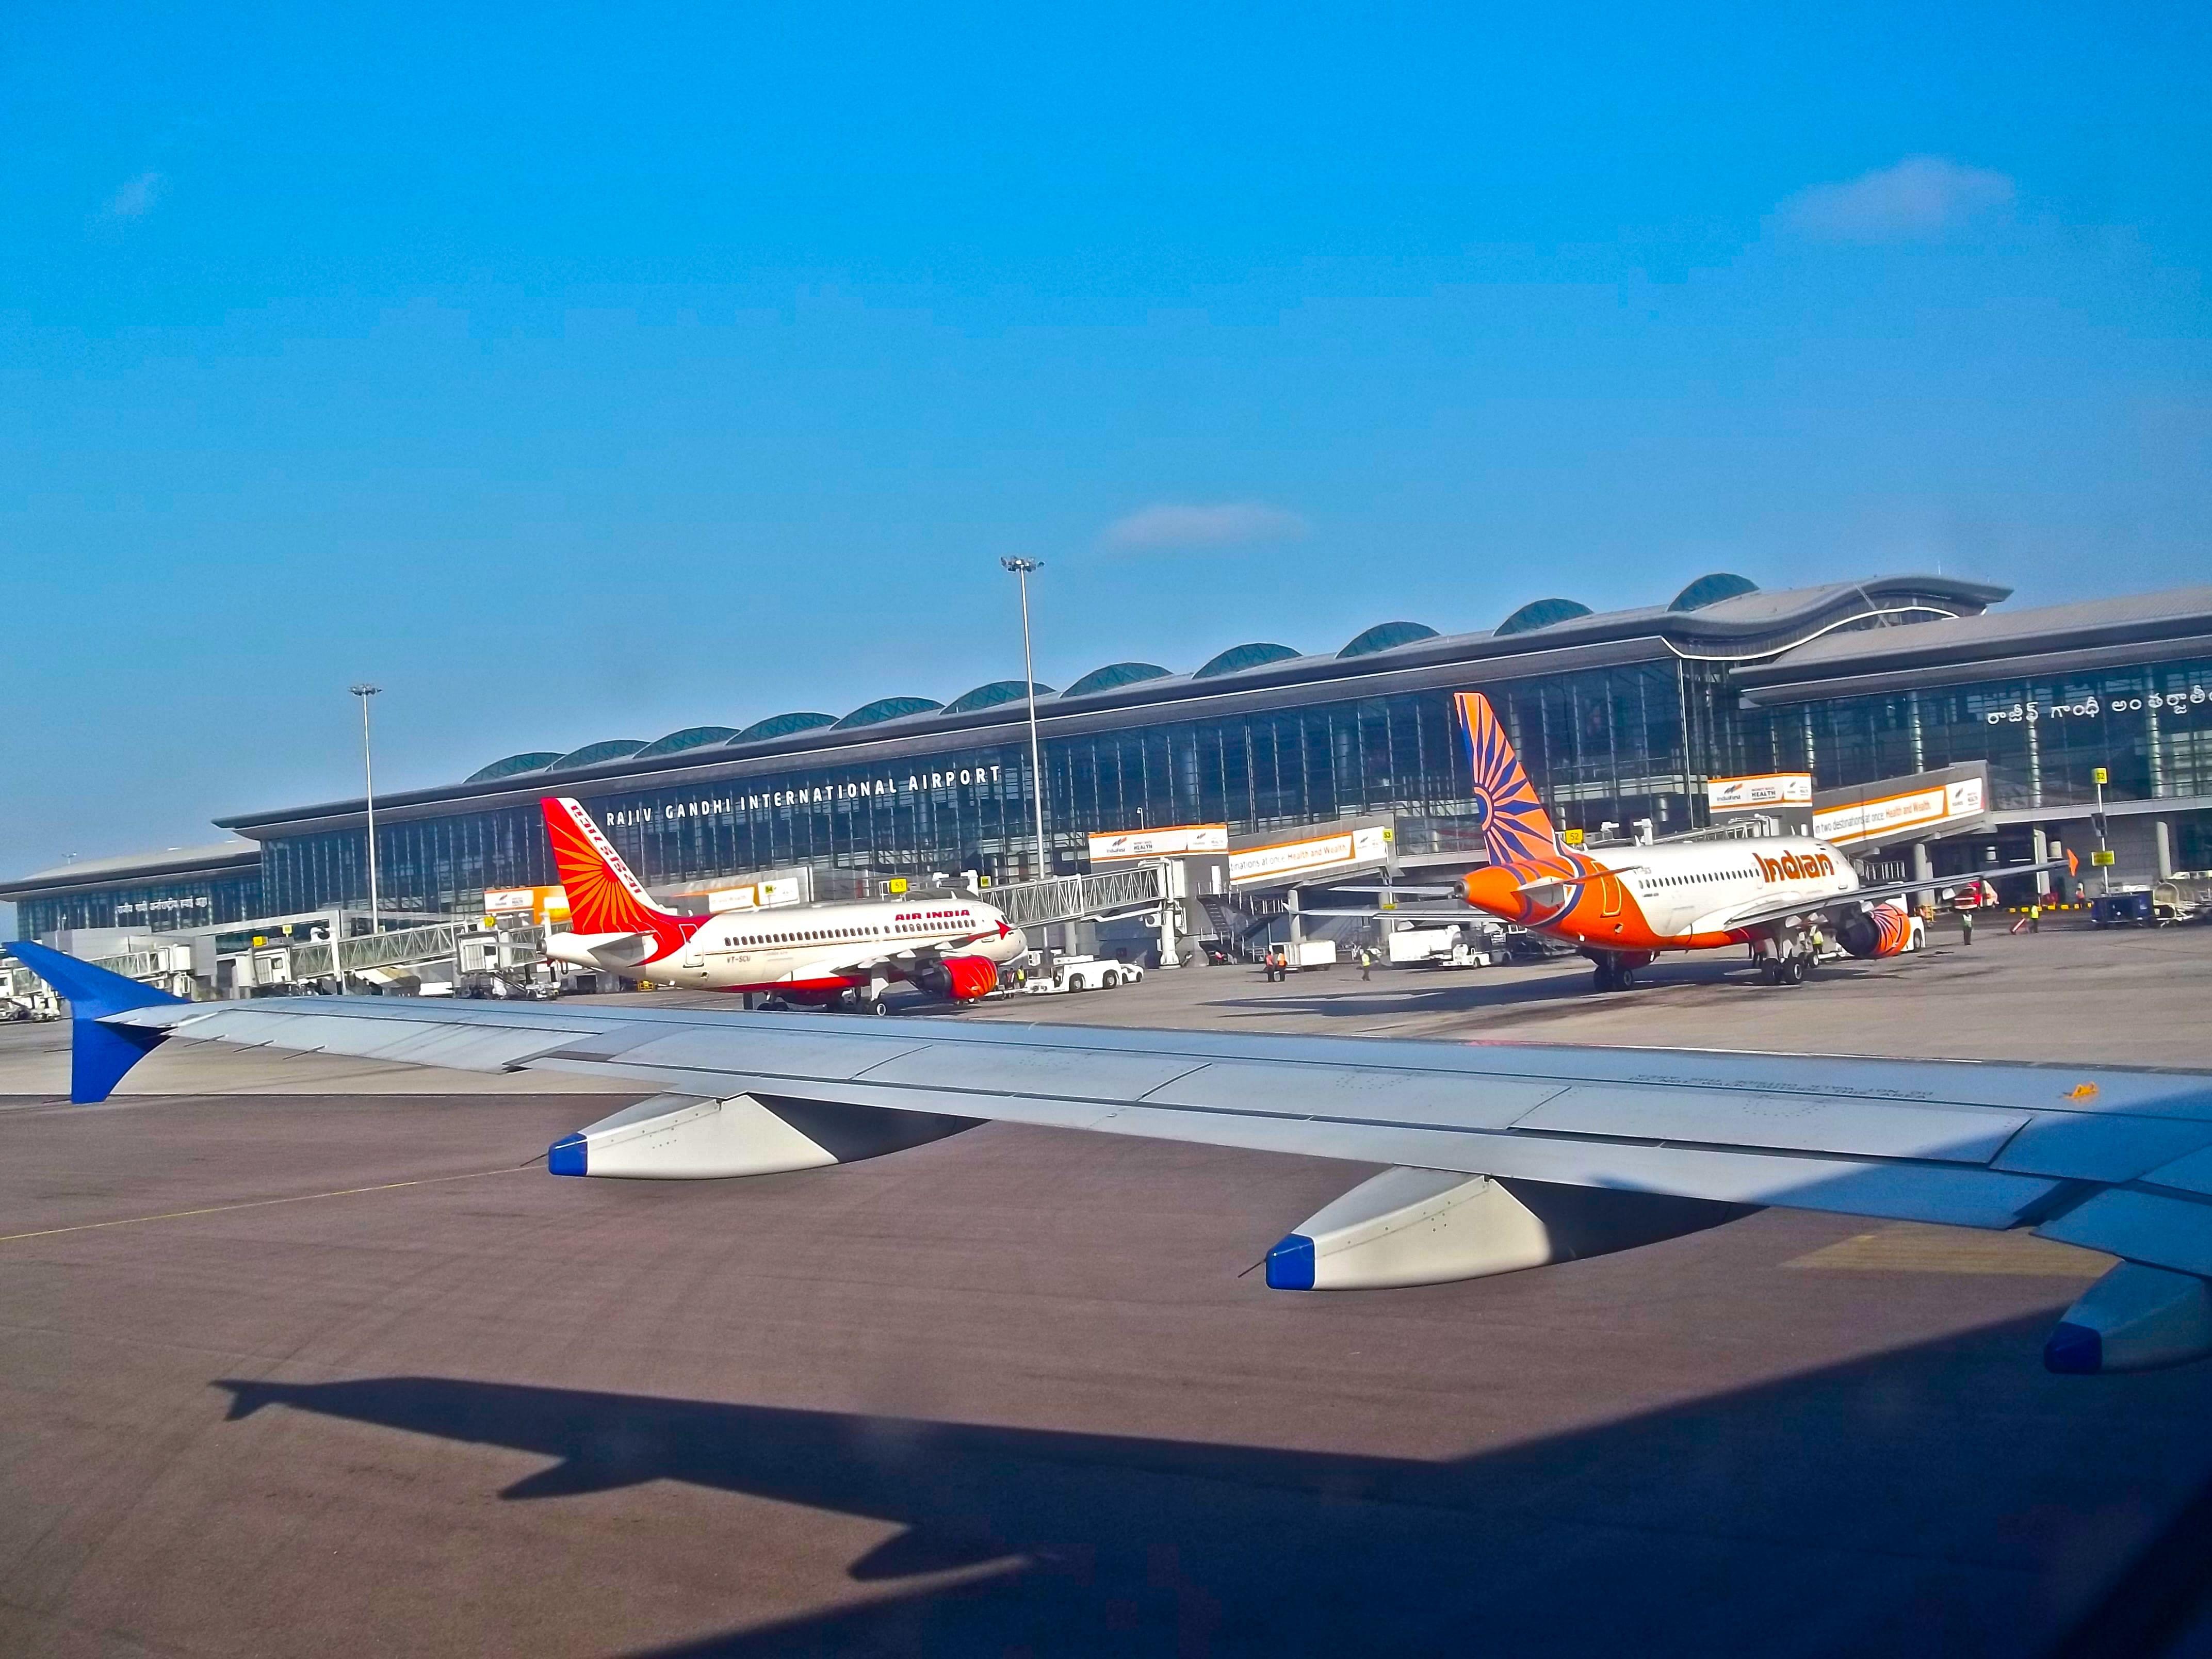 Airport,_Hyderabad,_India